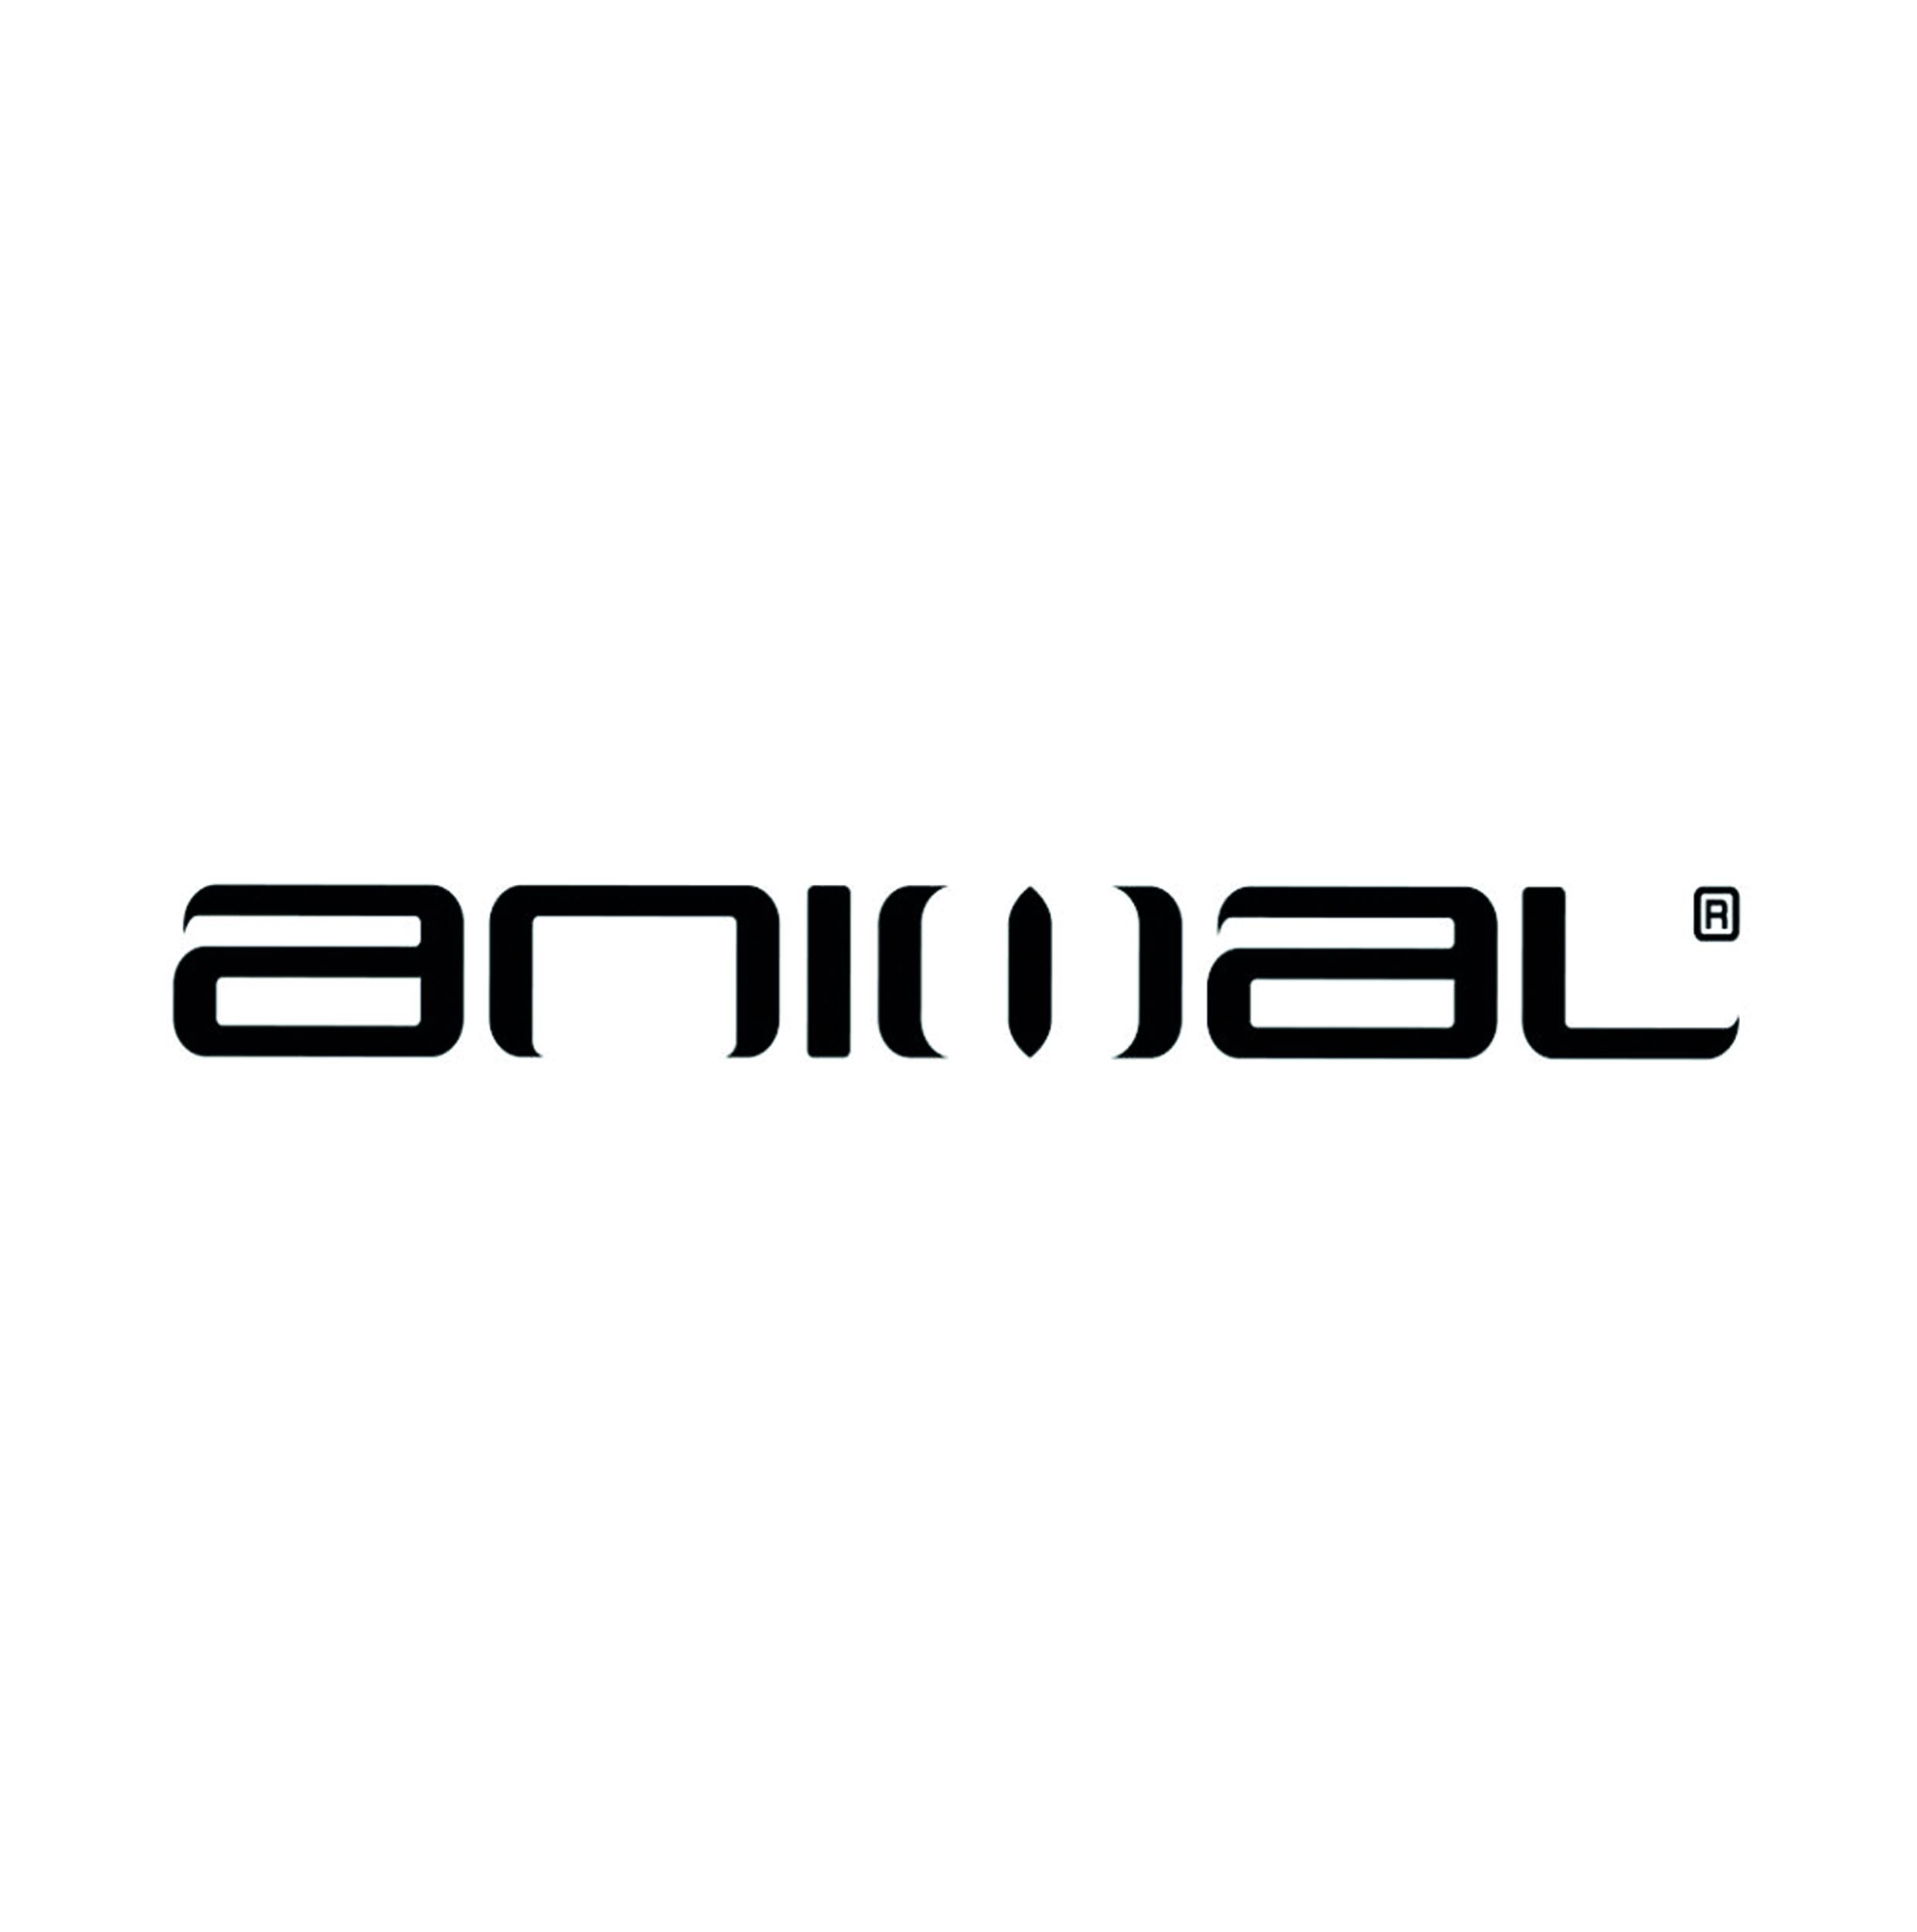 Animal resized.jpg